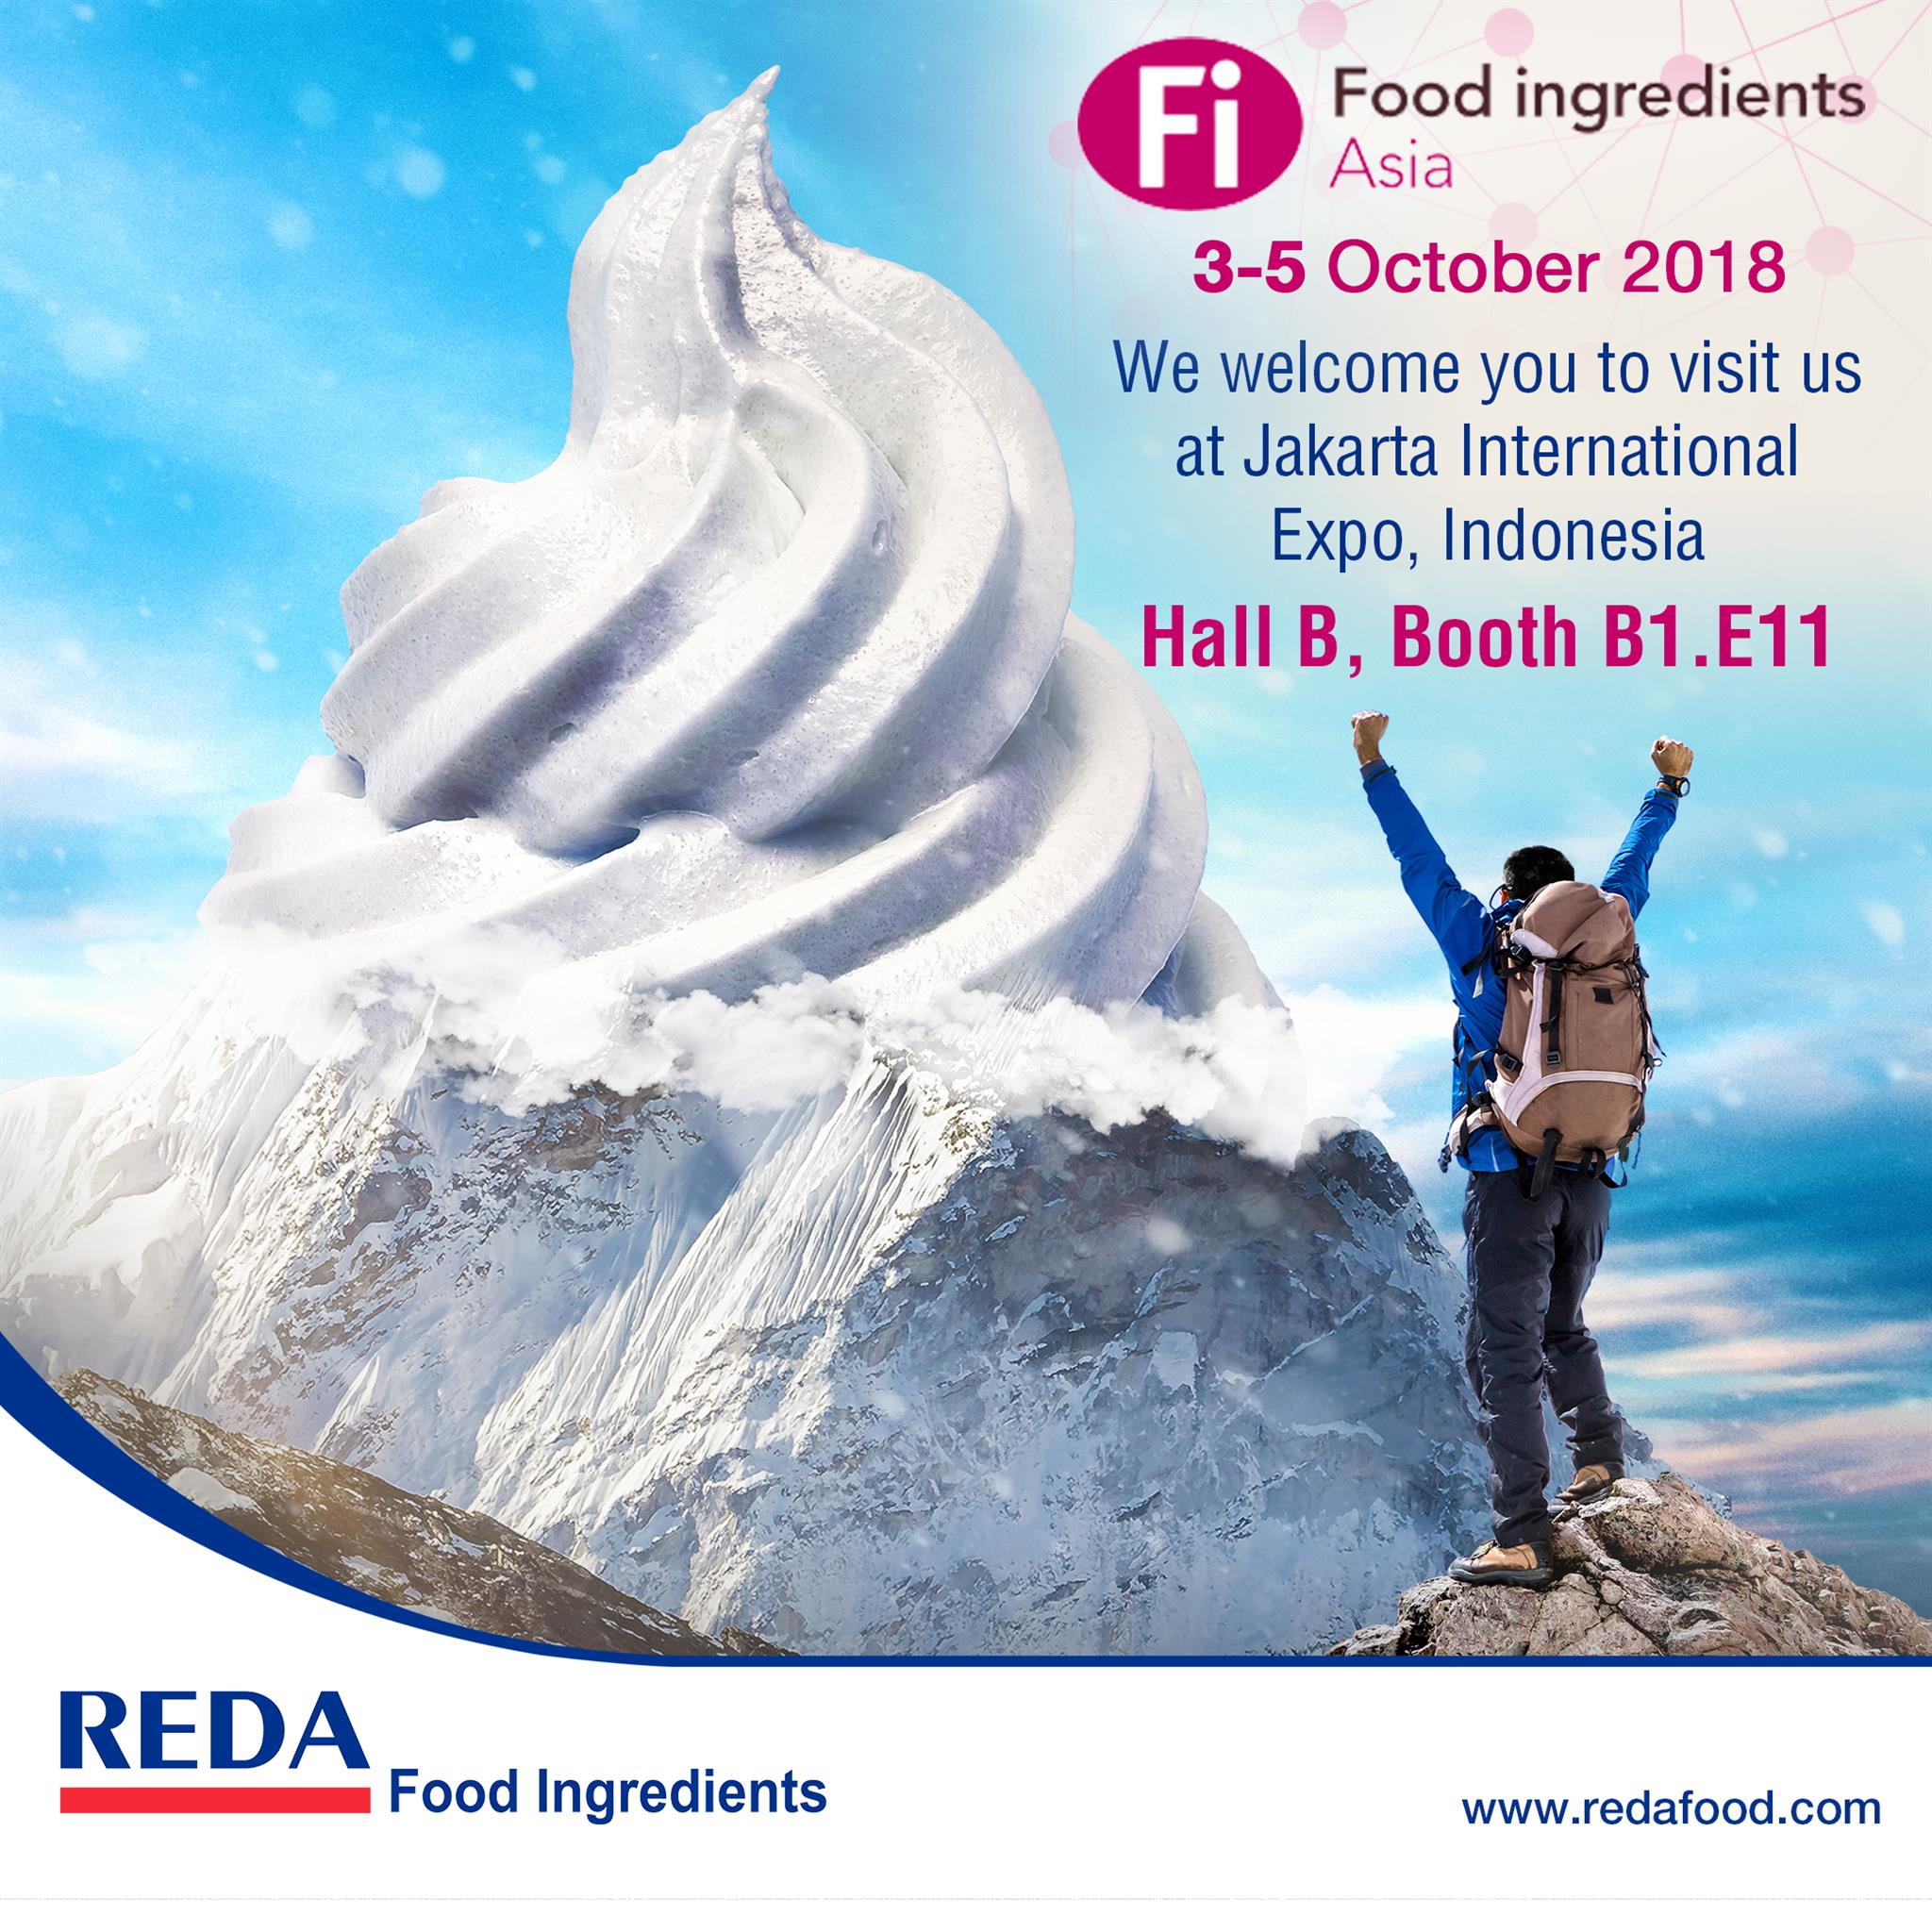 FiA Food Ingredients Asia